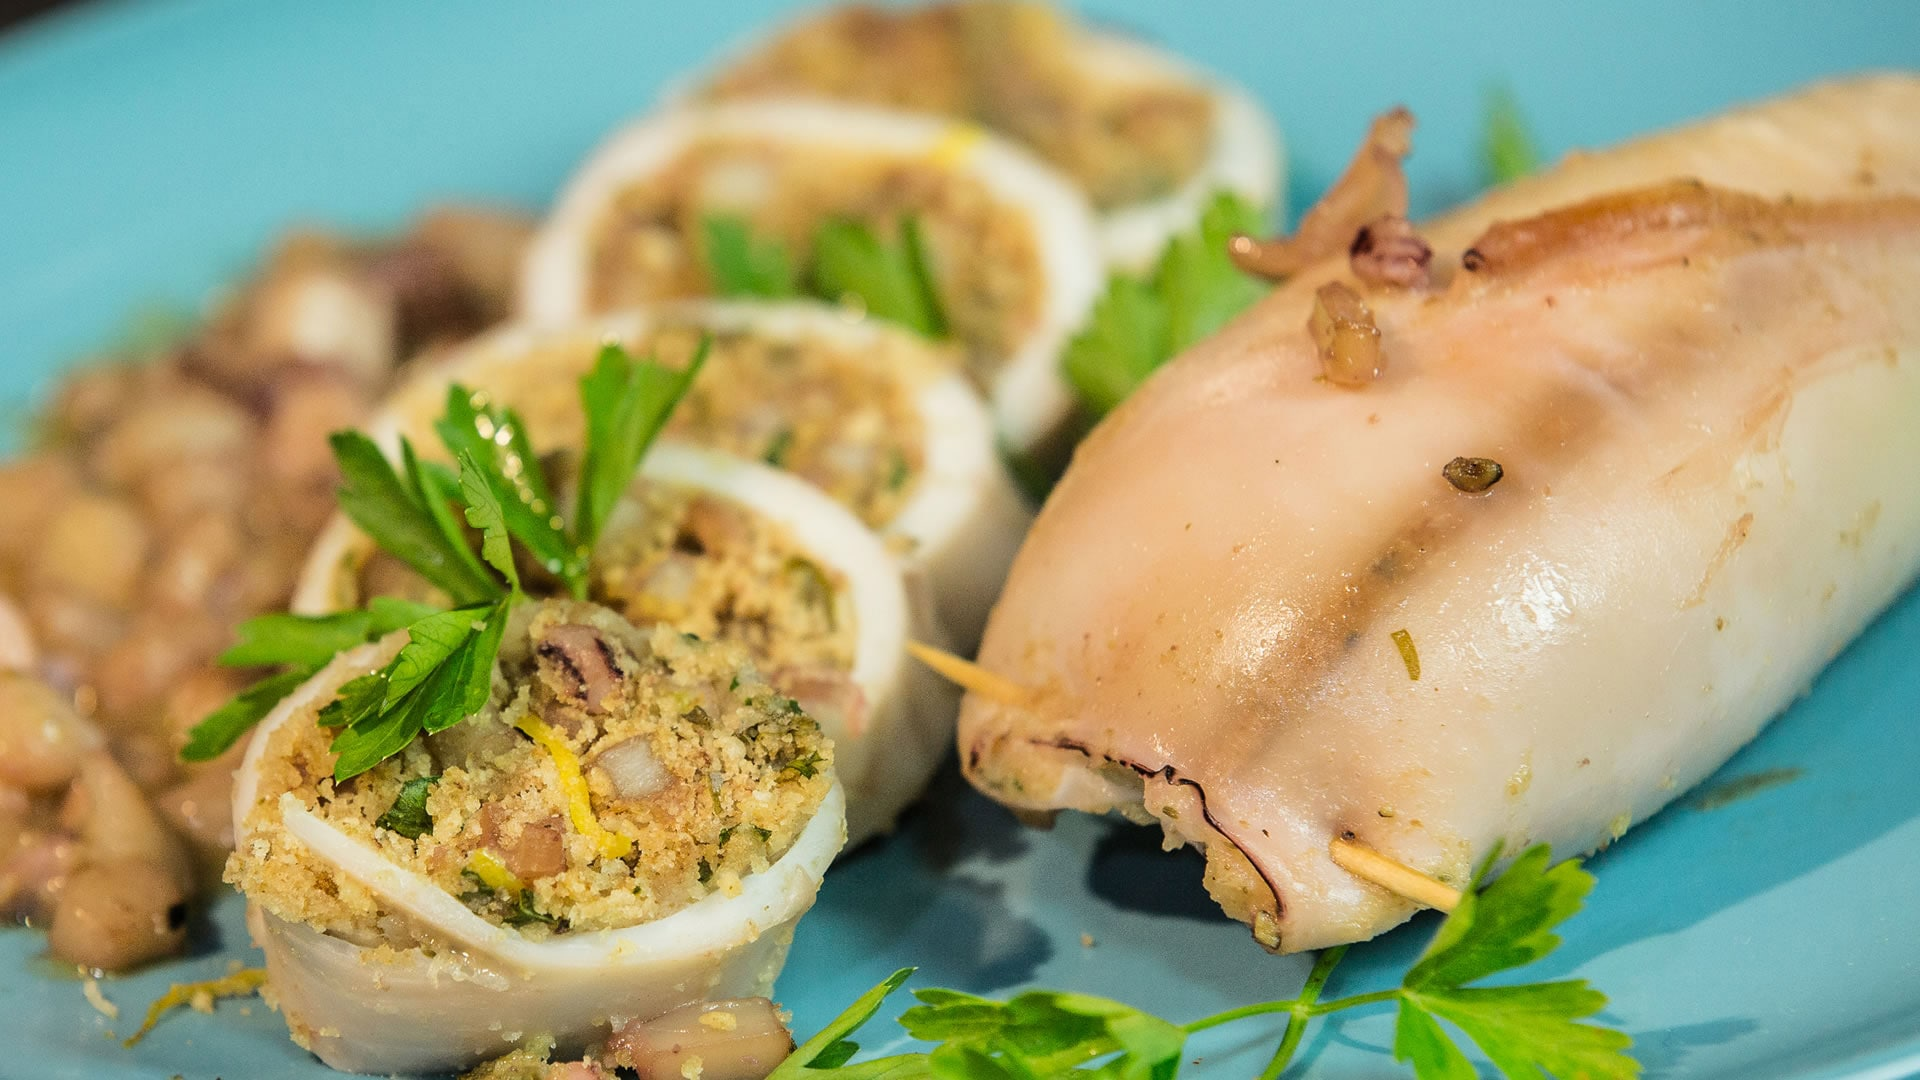 Calamari come cucinarli images cucinare i calamari foto